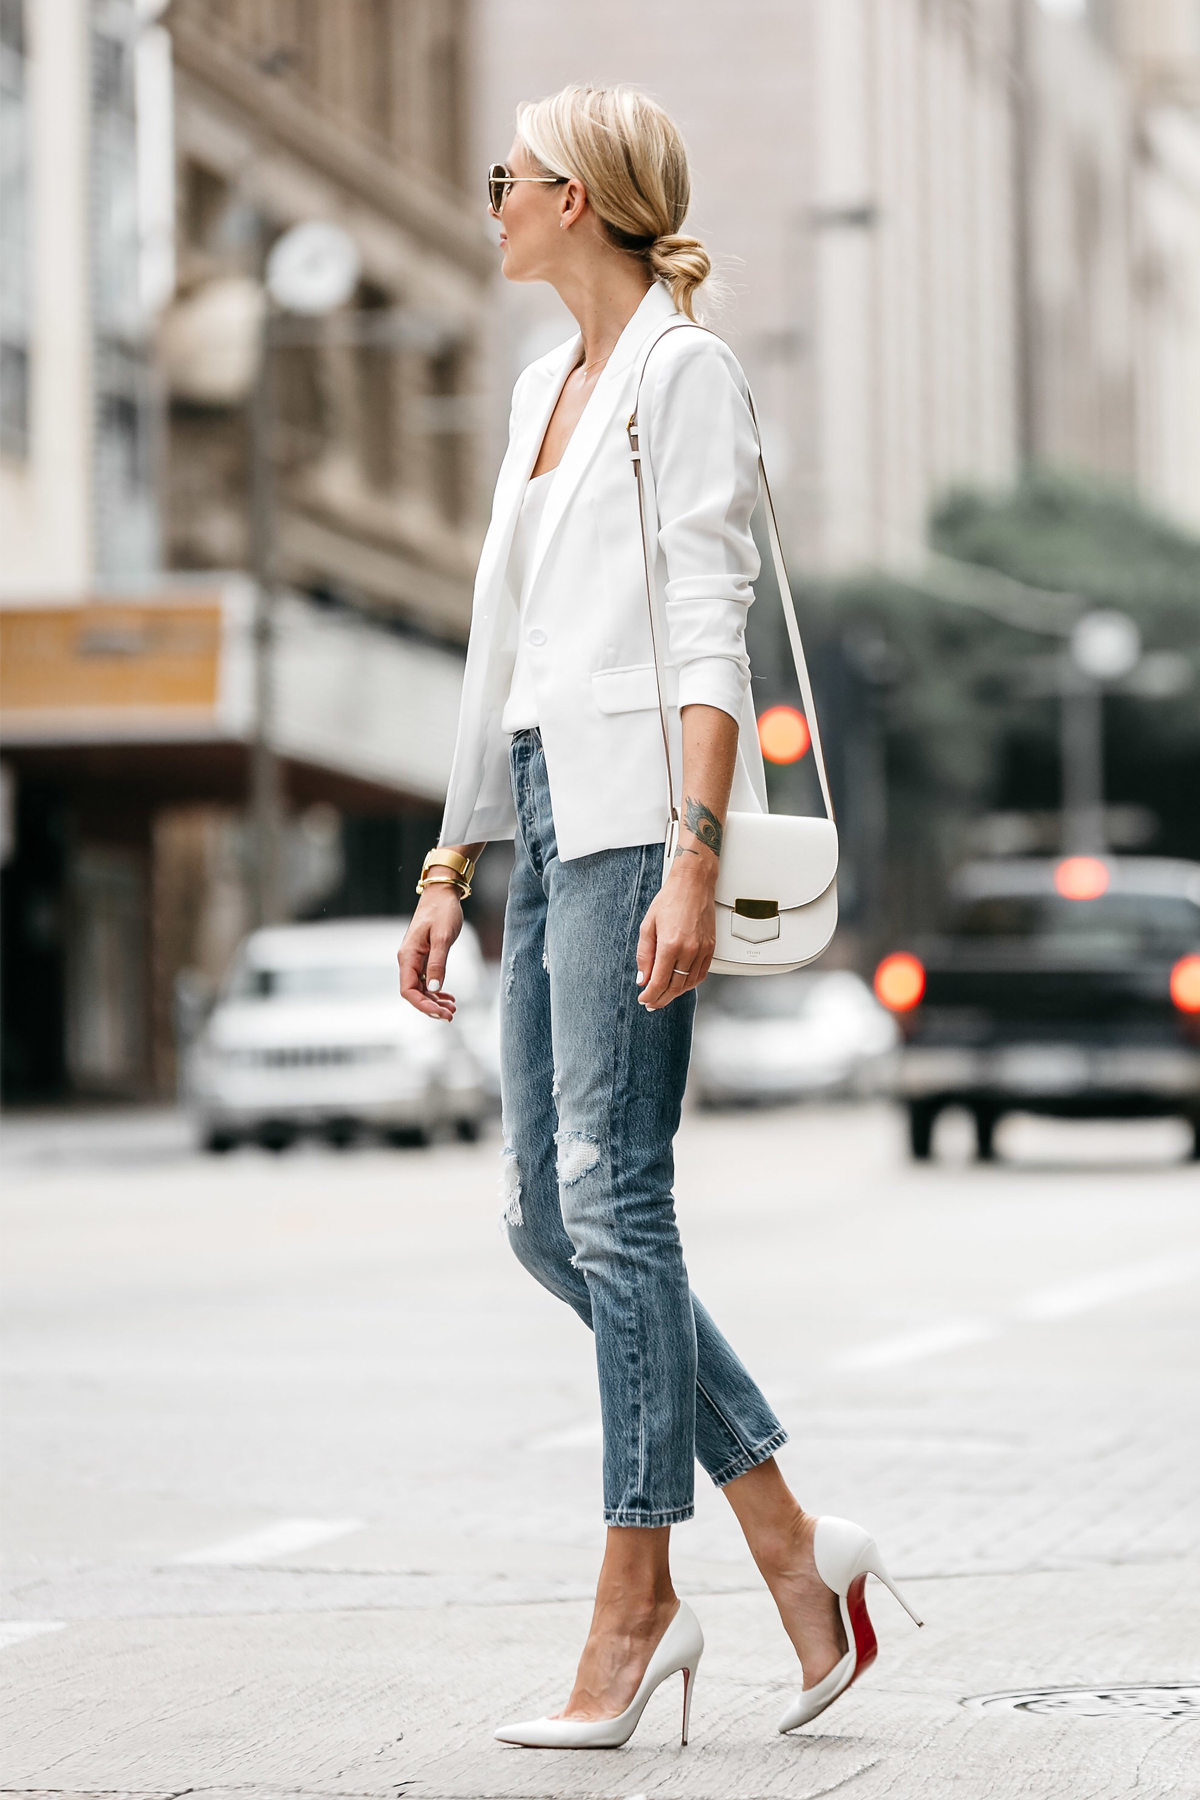 Fashion Jackson Blonde Woman Wearing White Blazer Distressed Jeans Outfit